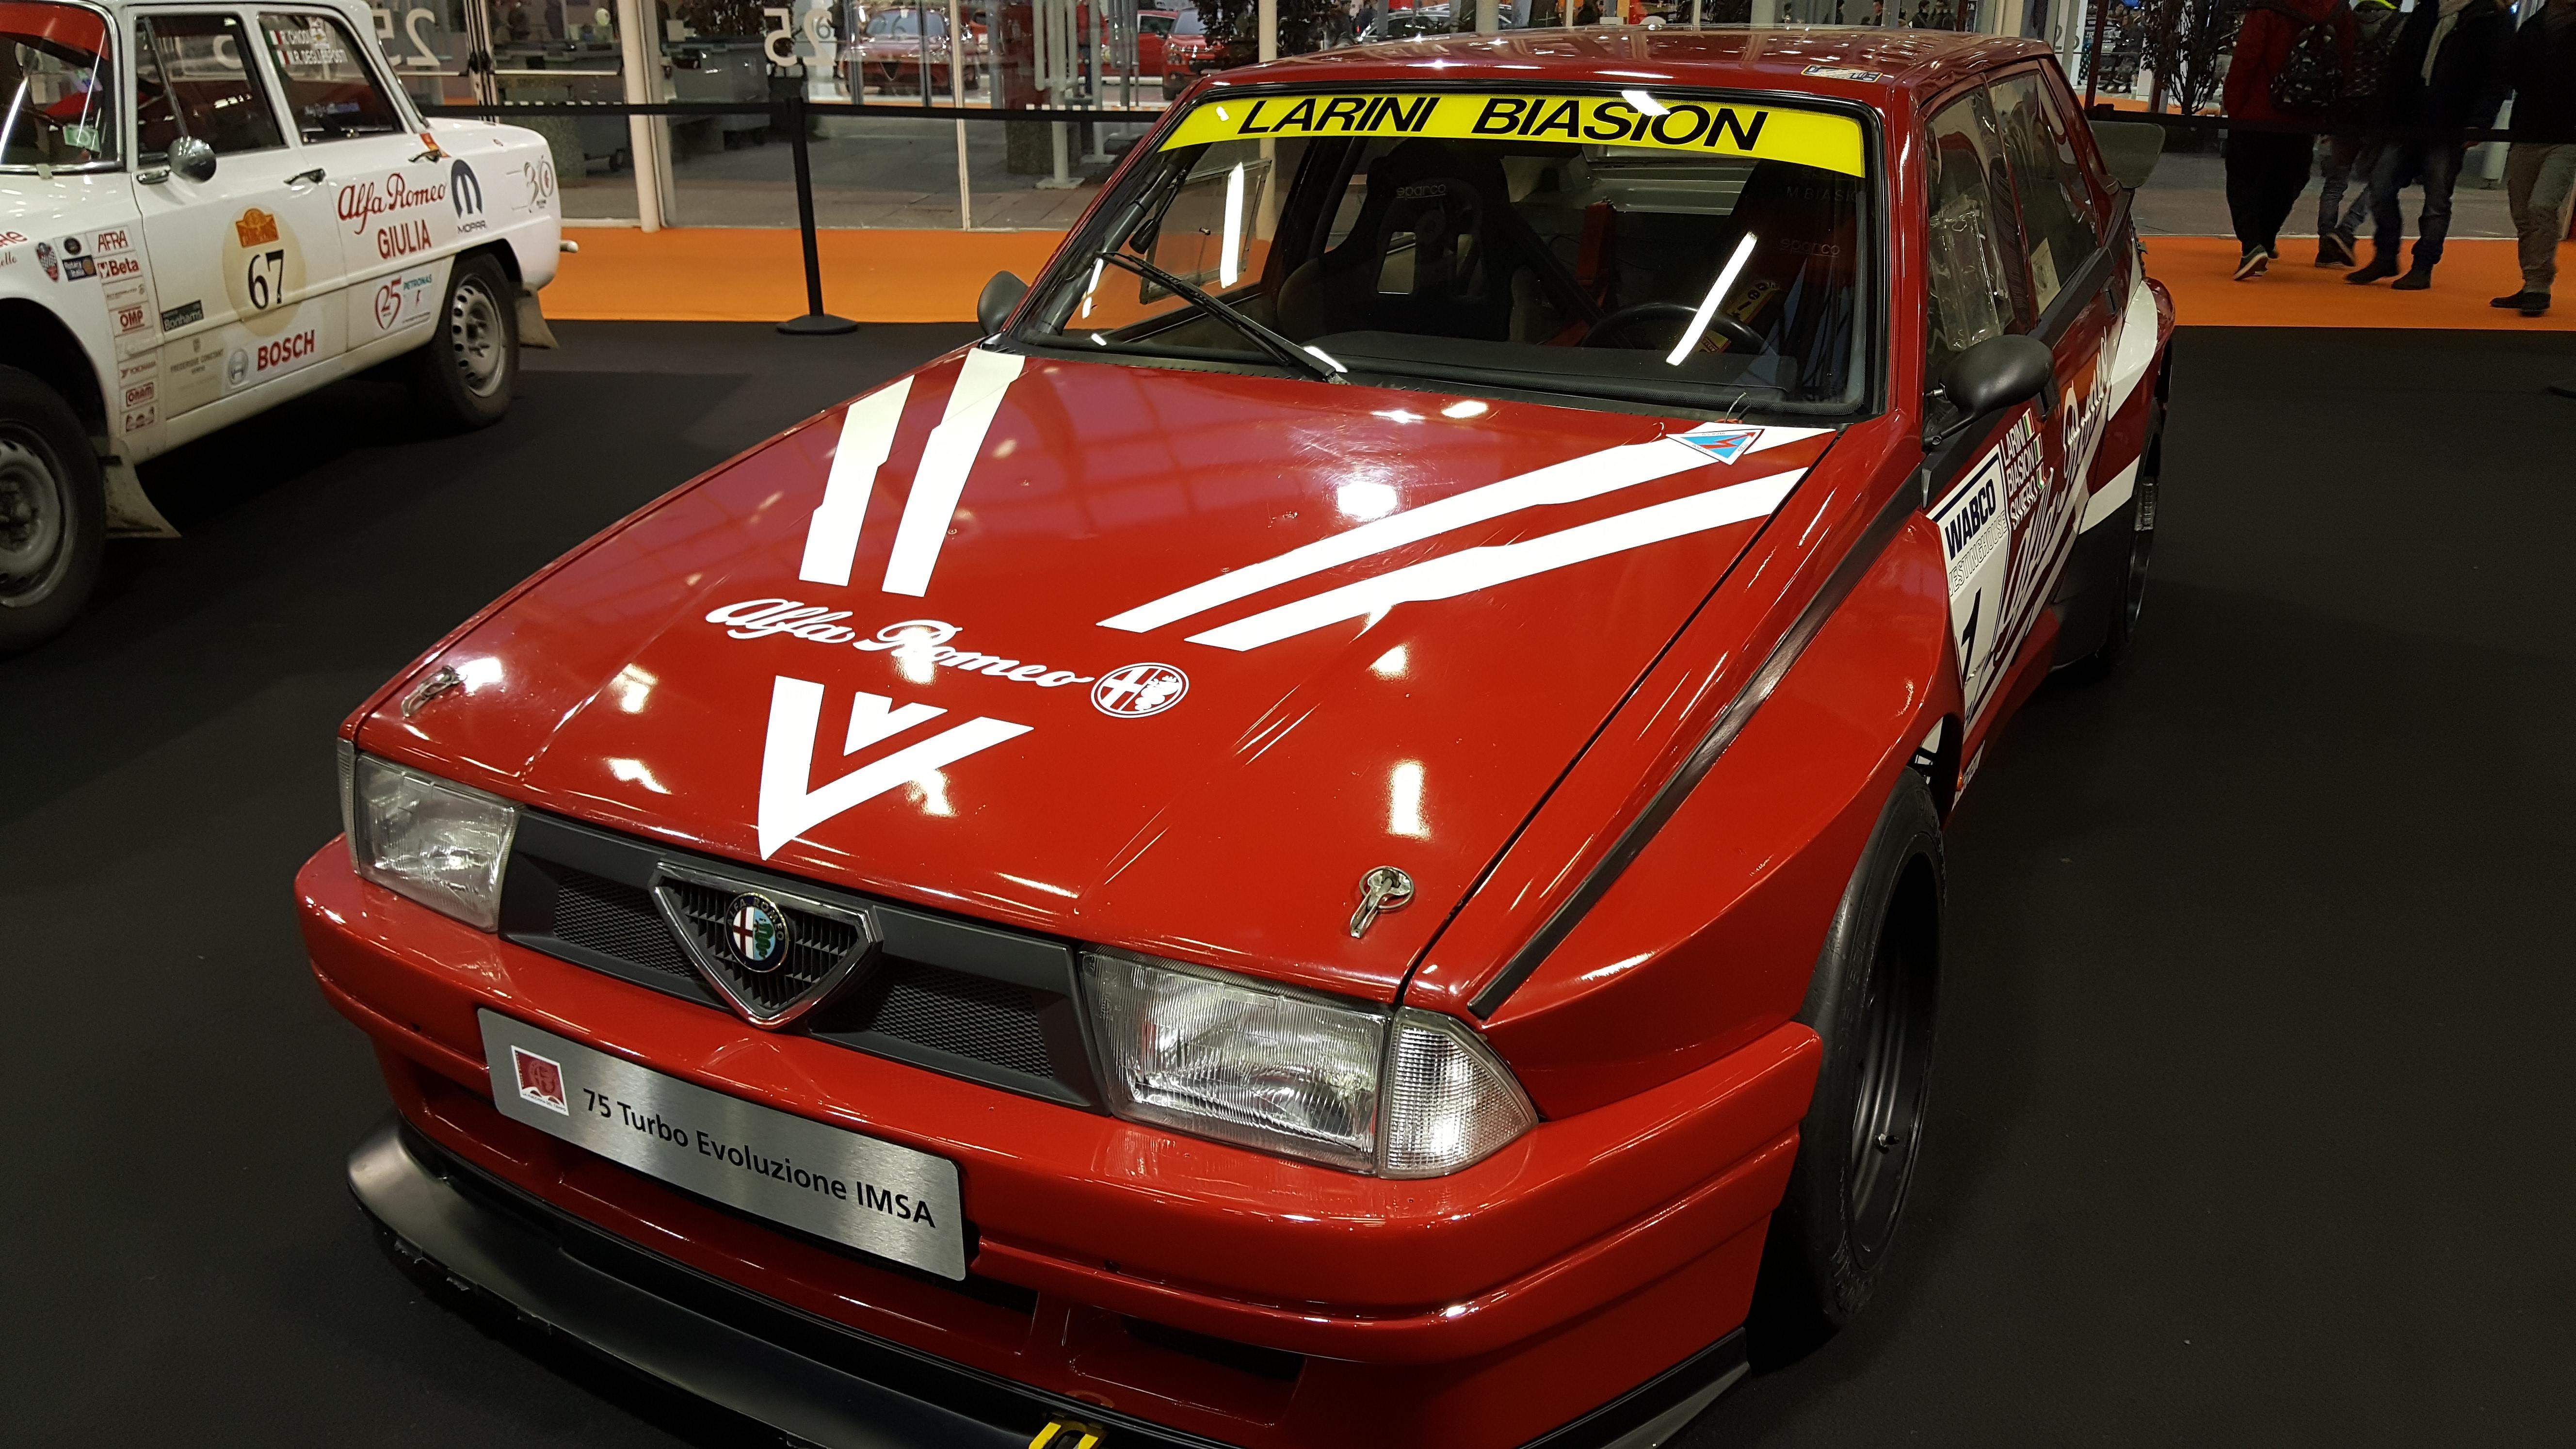 File Alfa Romeo 75 Turbo Evoluzione Imsa Jpg Wikimedia Commons